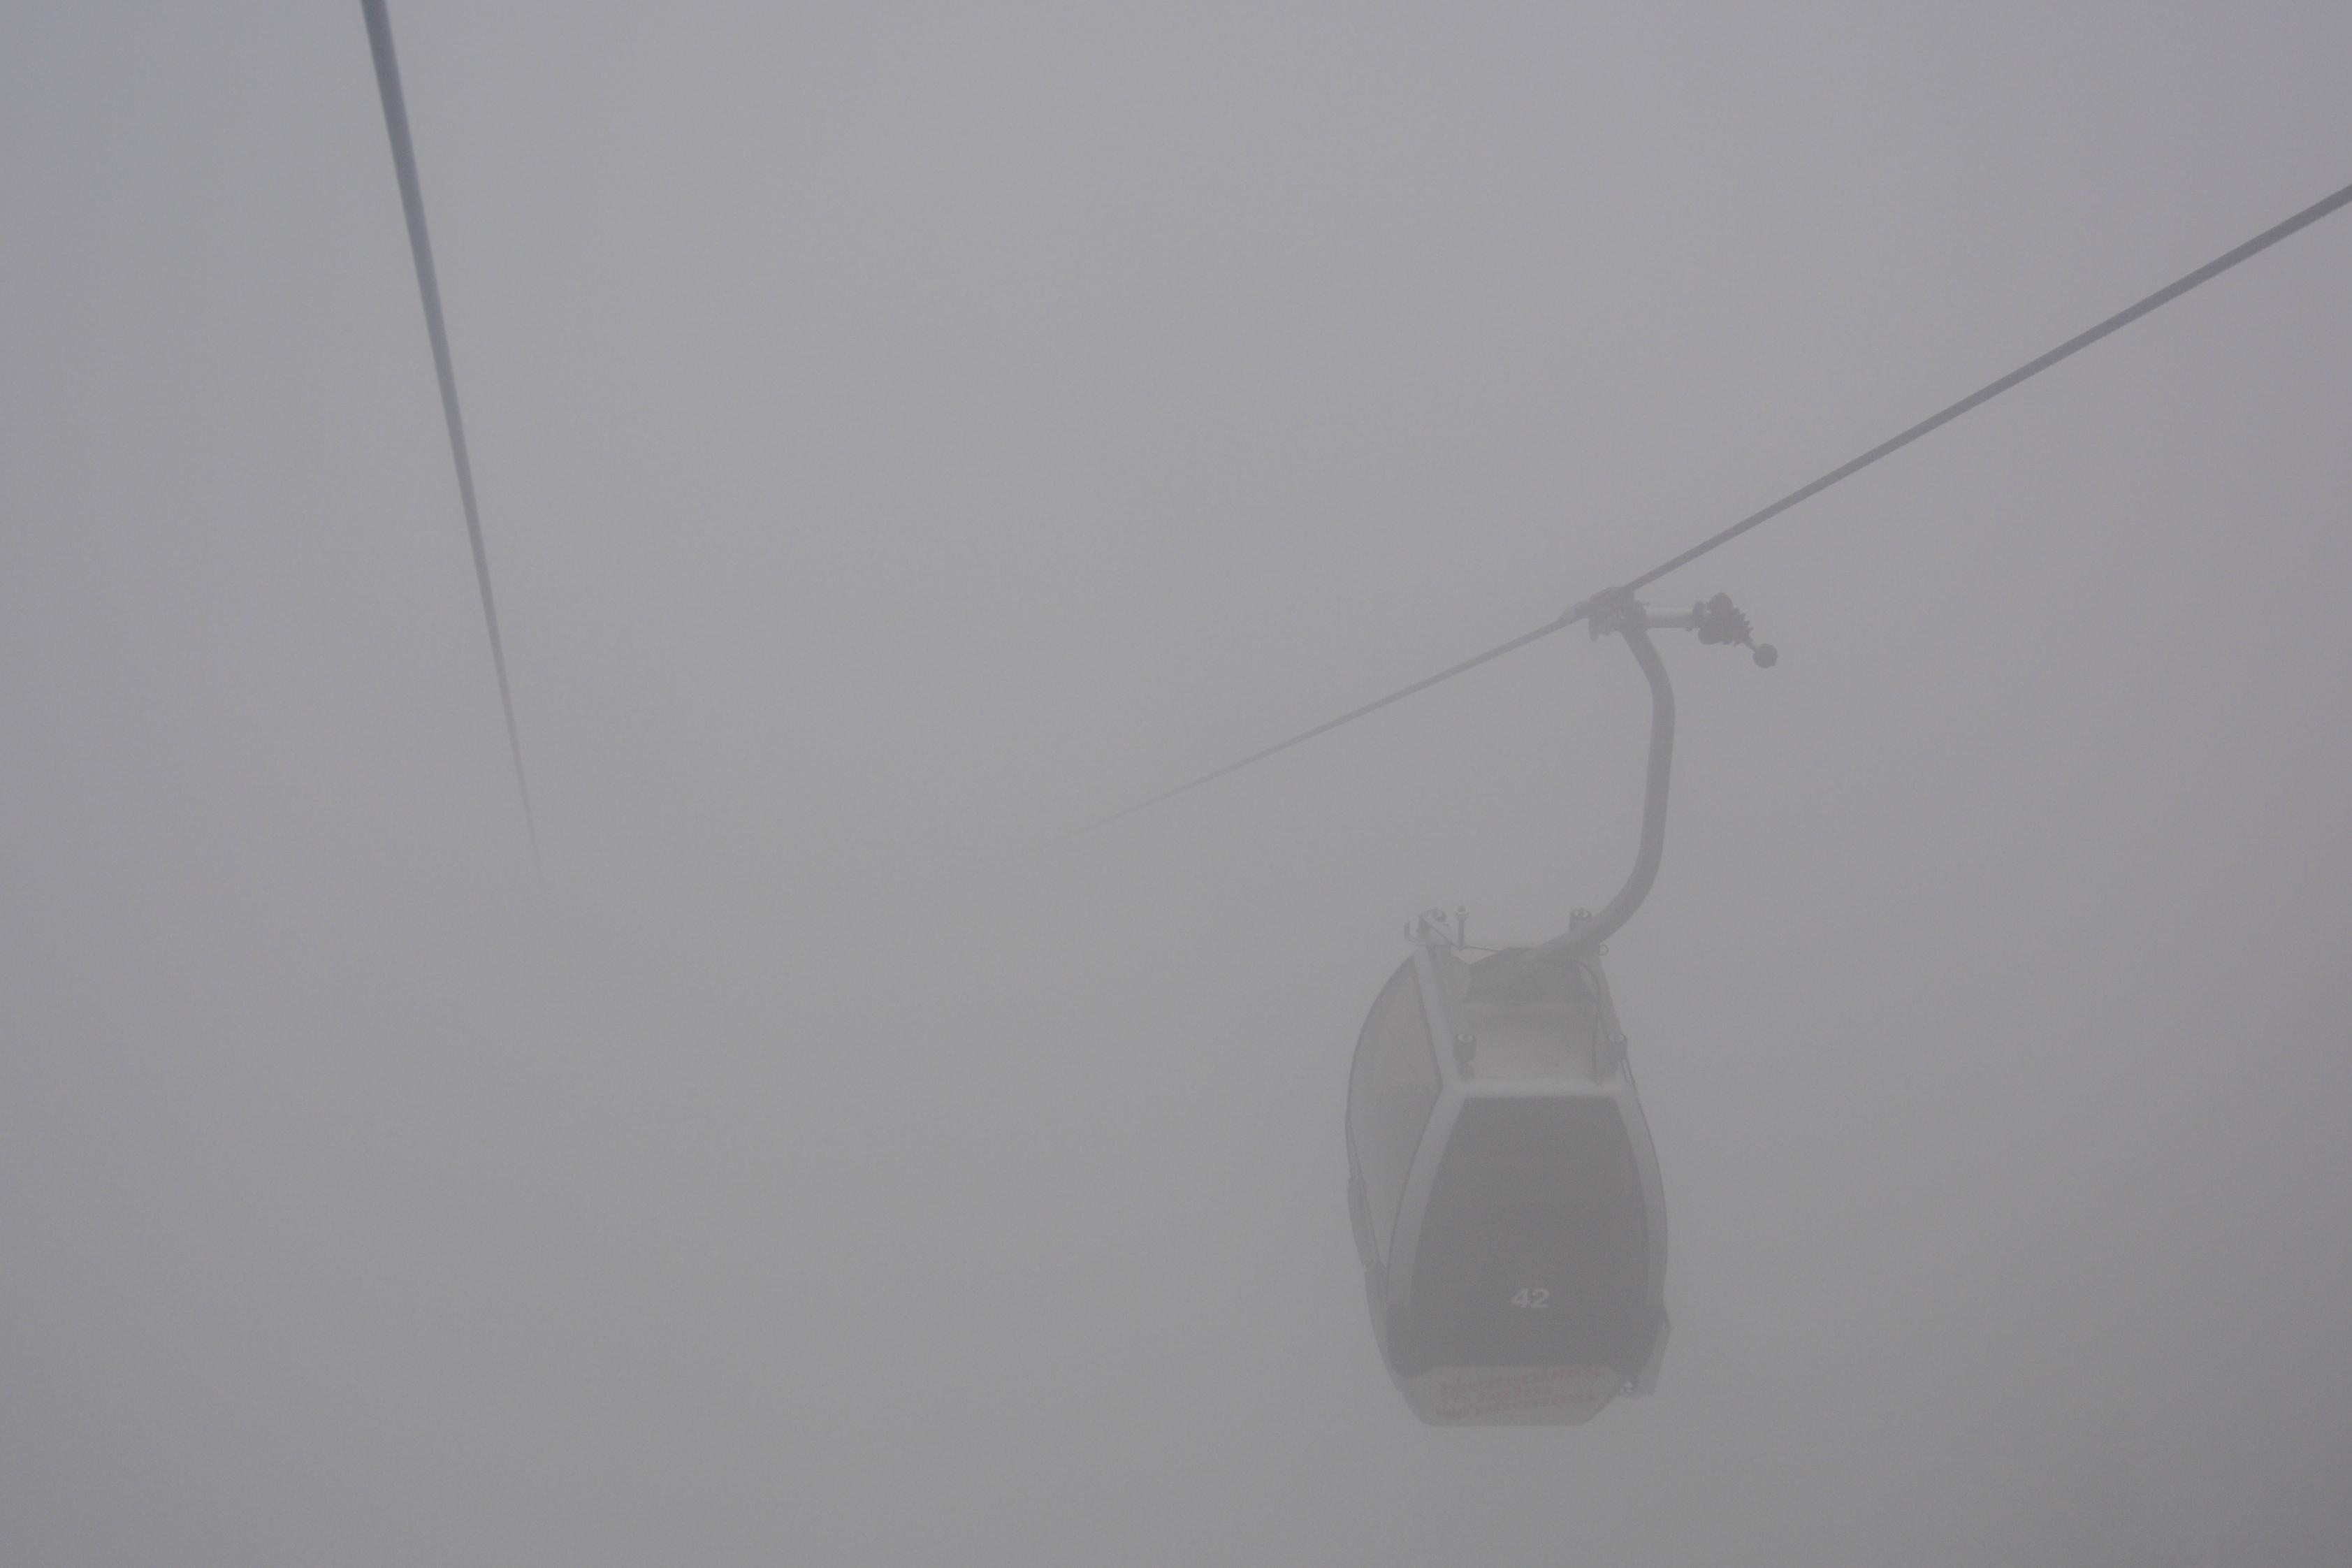 W0323 Gondel im Nebel.jpg